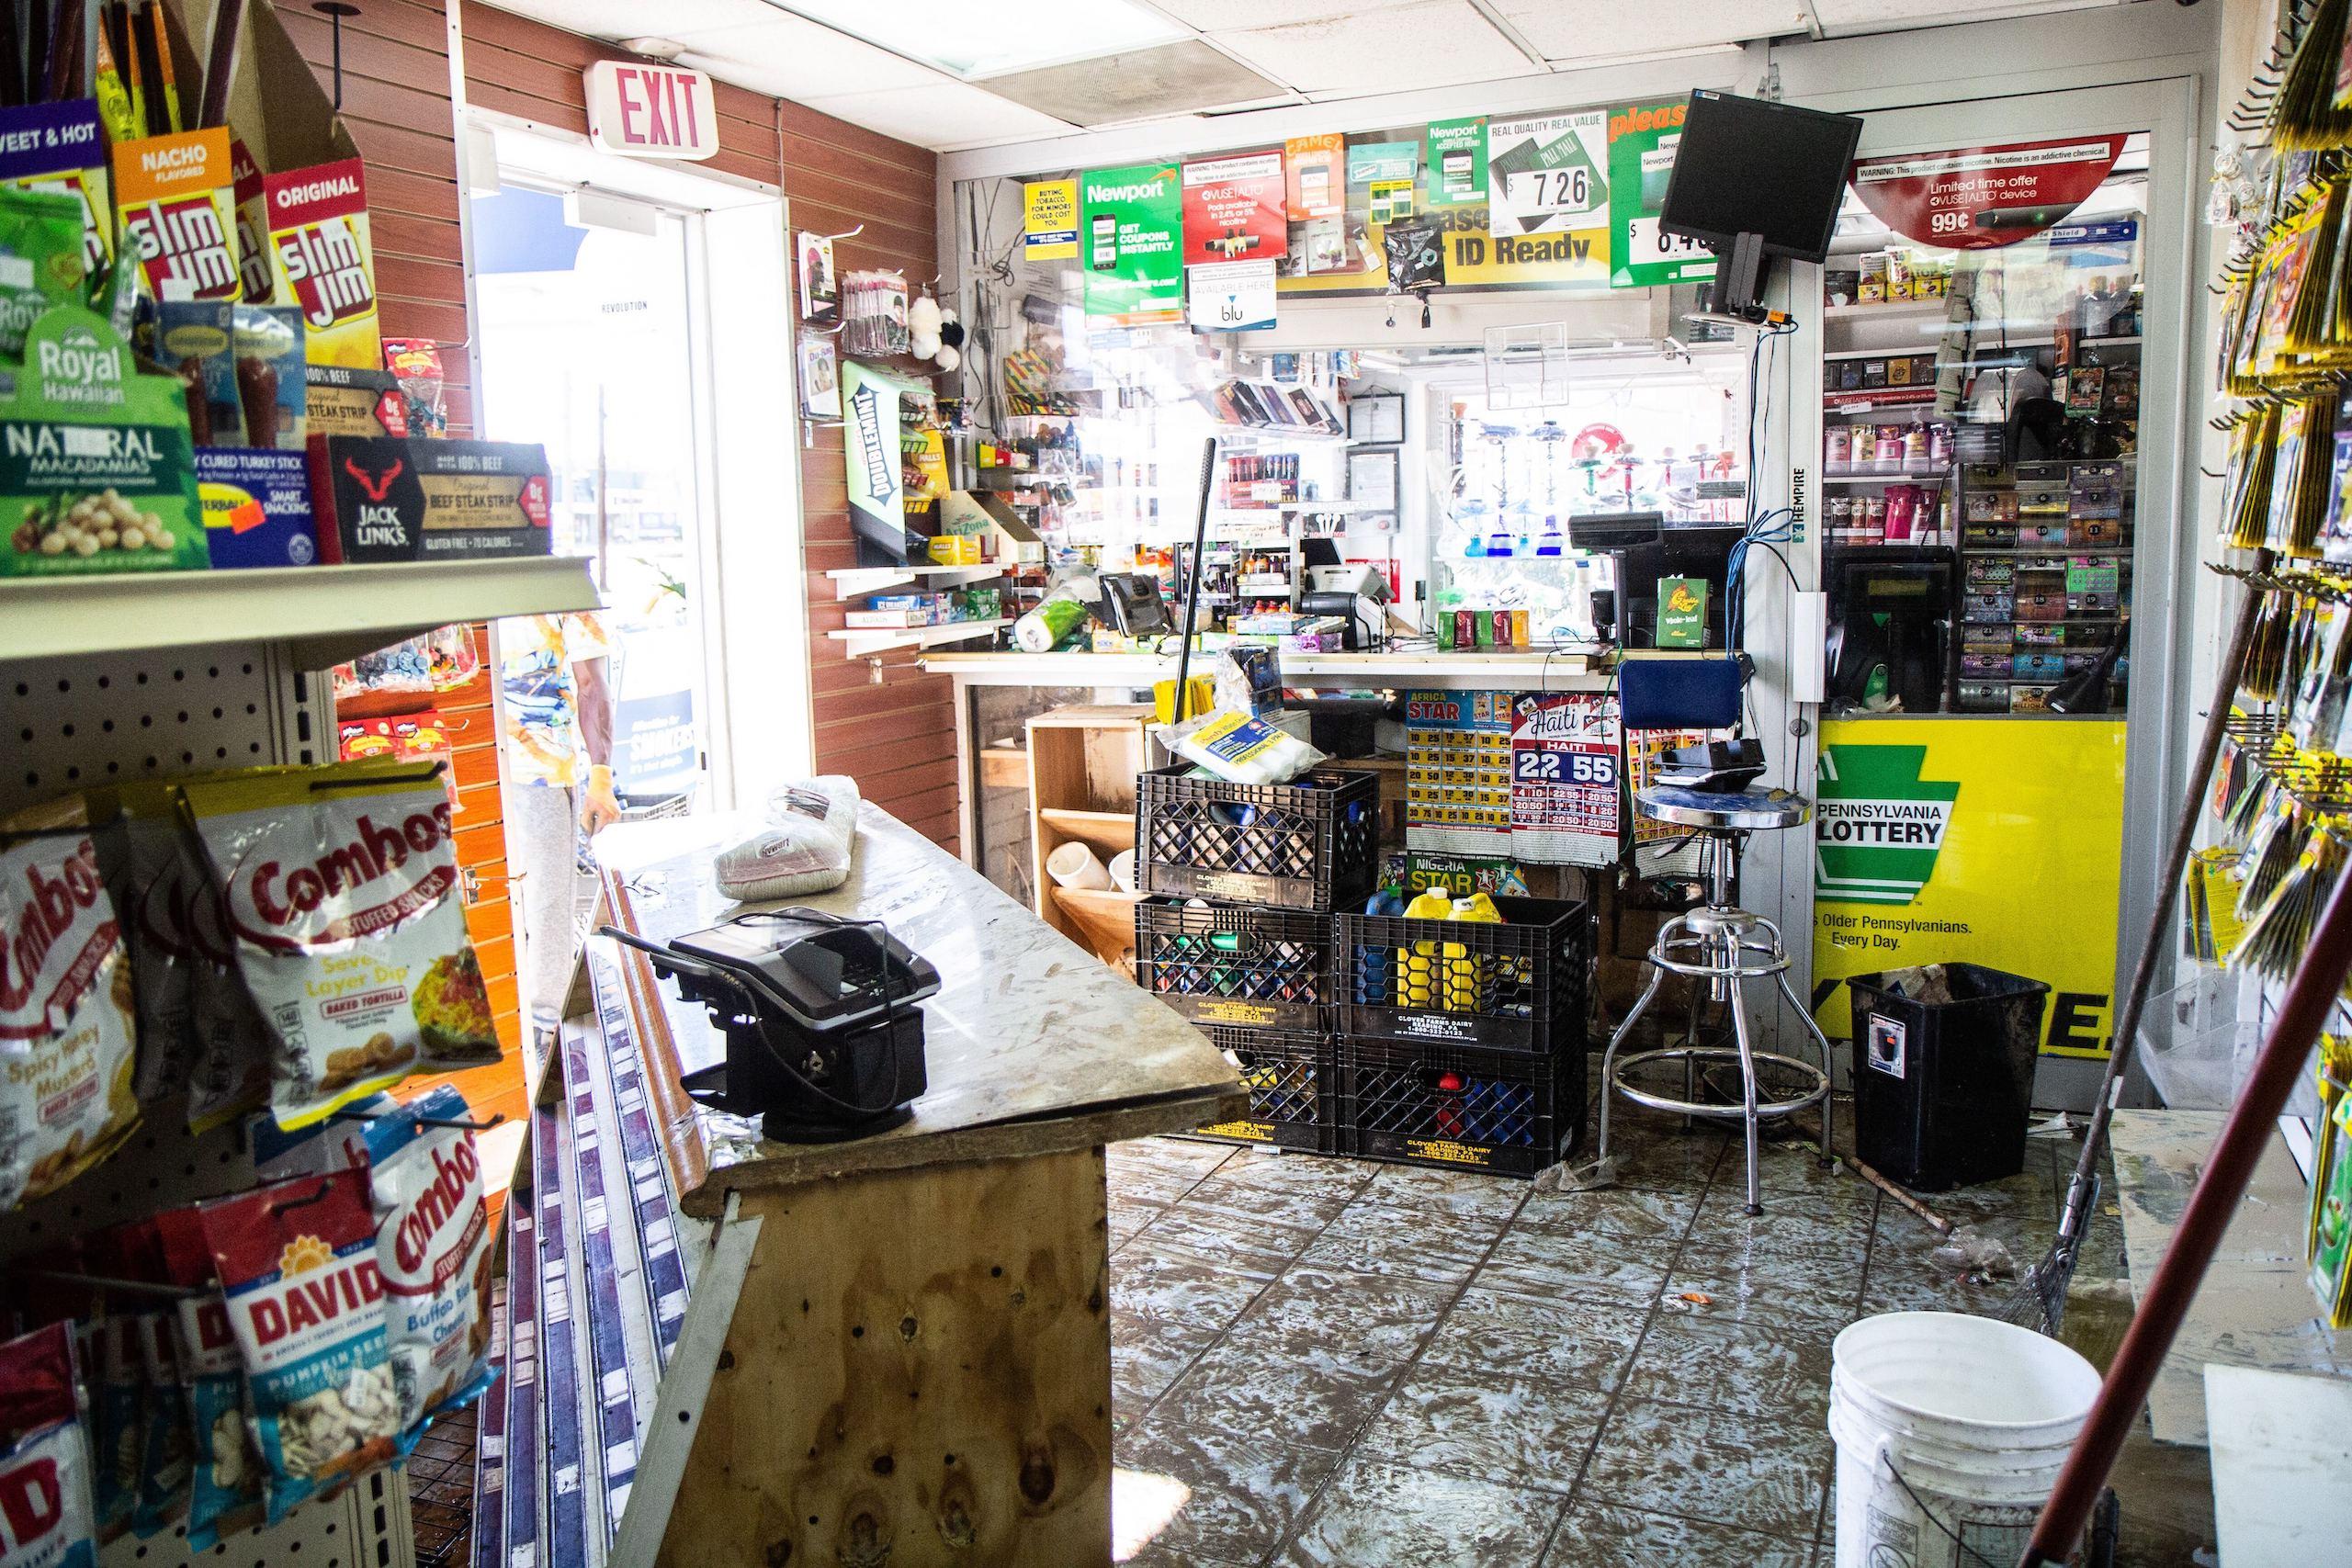 69th Street Car Wash and Smoke Shop